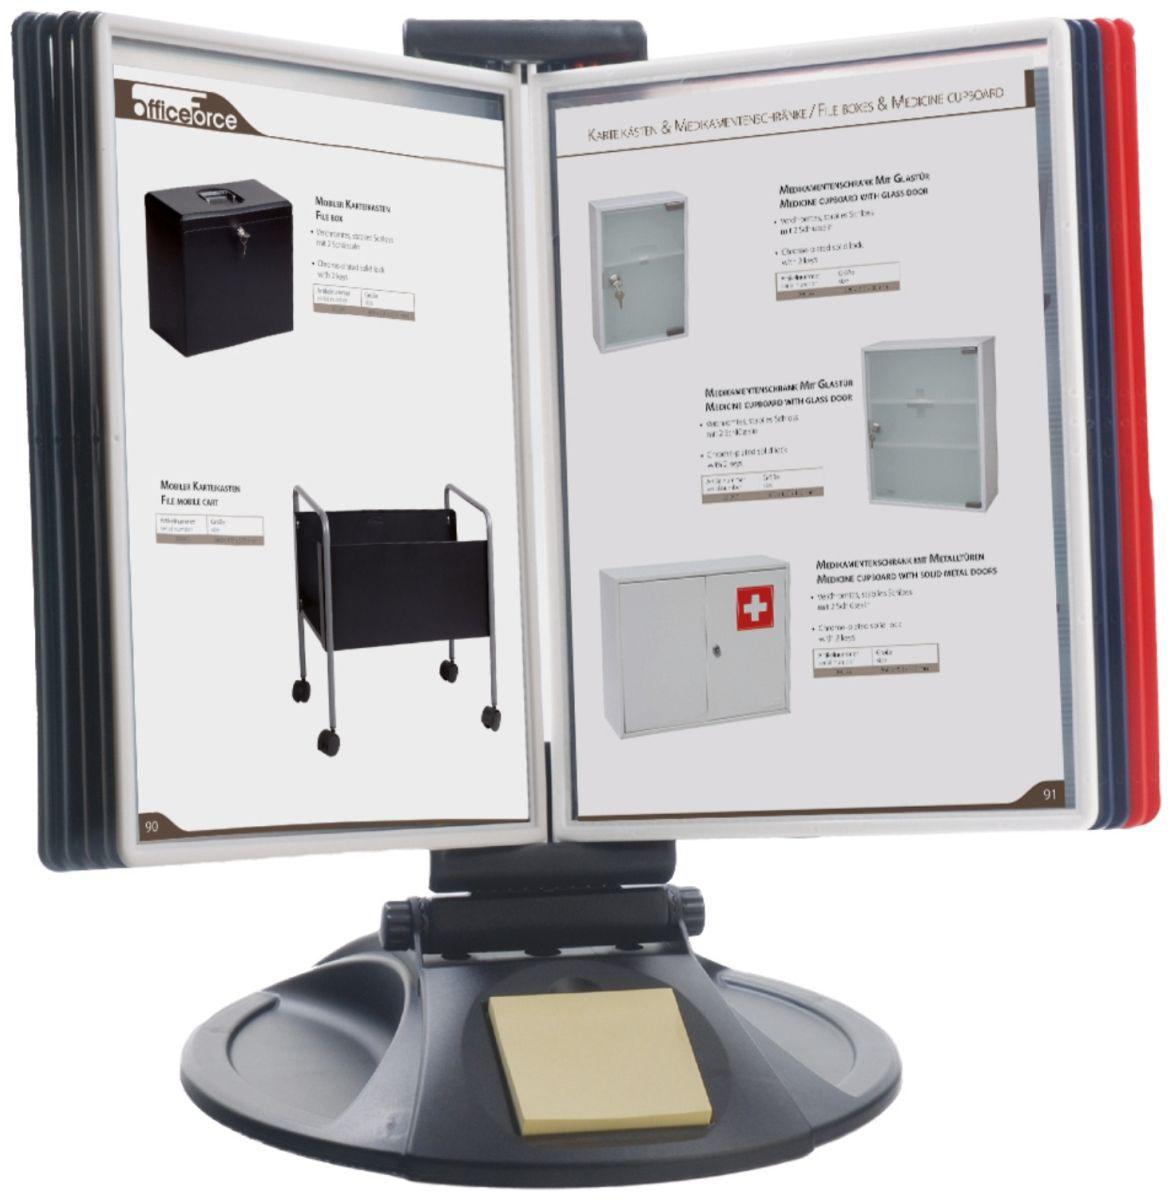 Office Force Stationery Настольная демосистема Qulck-Vlew Information Display А4 круглая подставка цена и фото